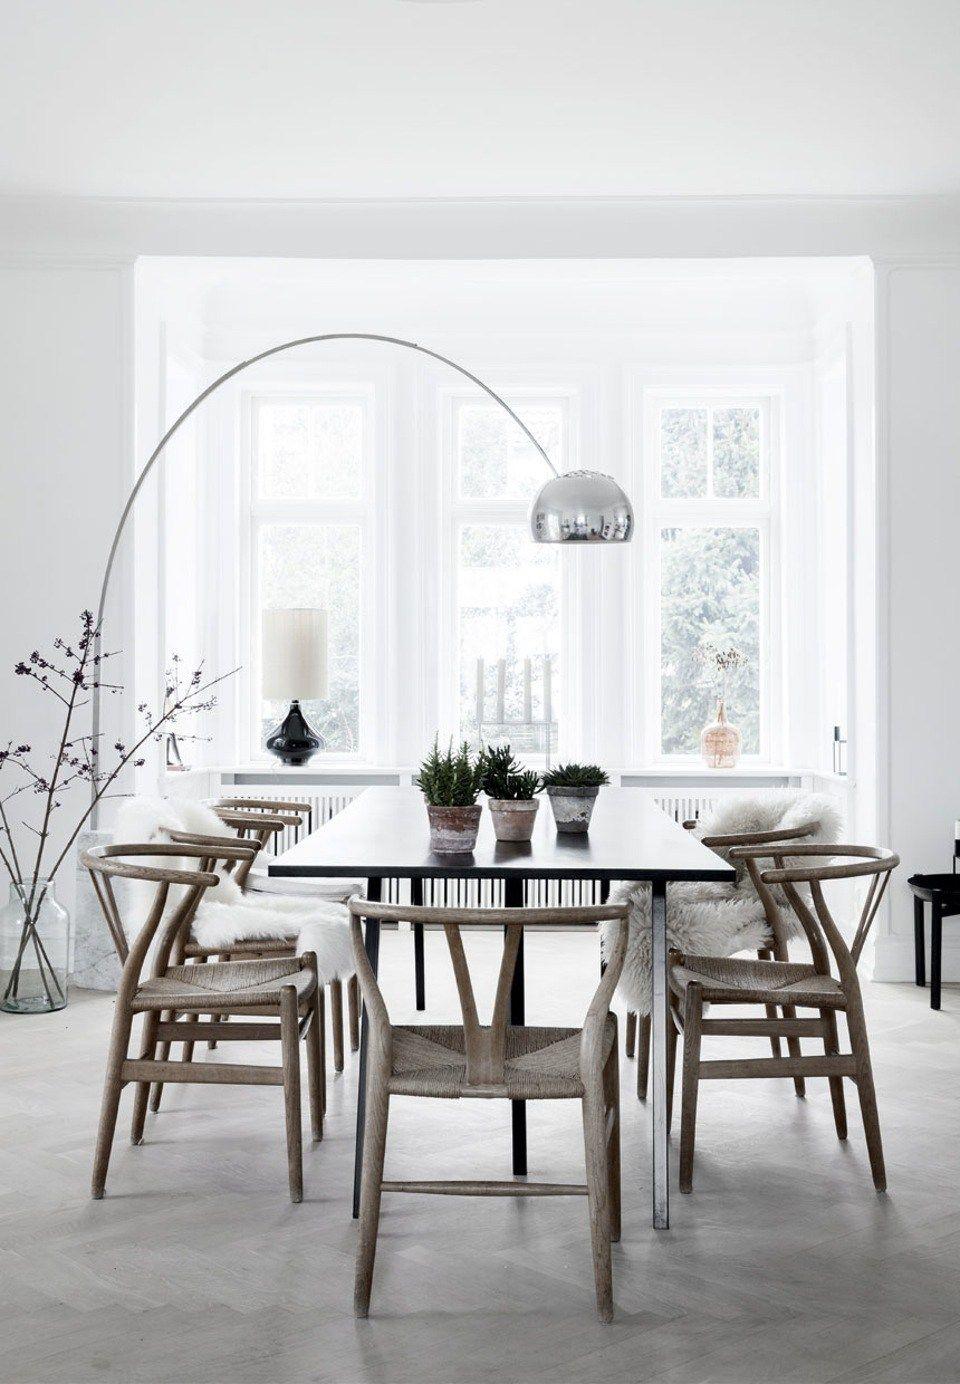 Lampade Sopra Tavolo Da Pranzo lampada arco su tavolo pranzo | casa | matrum belysning